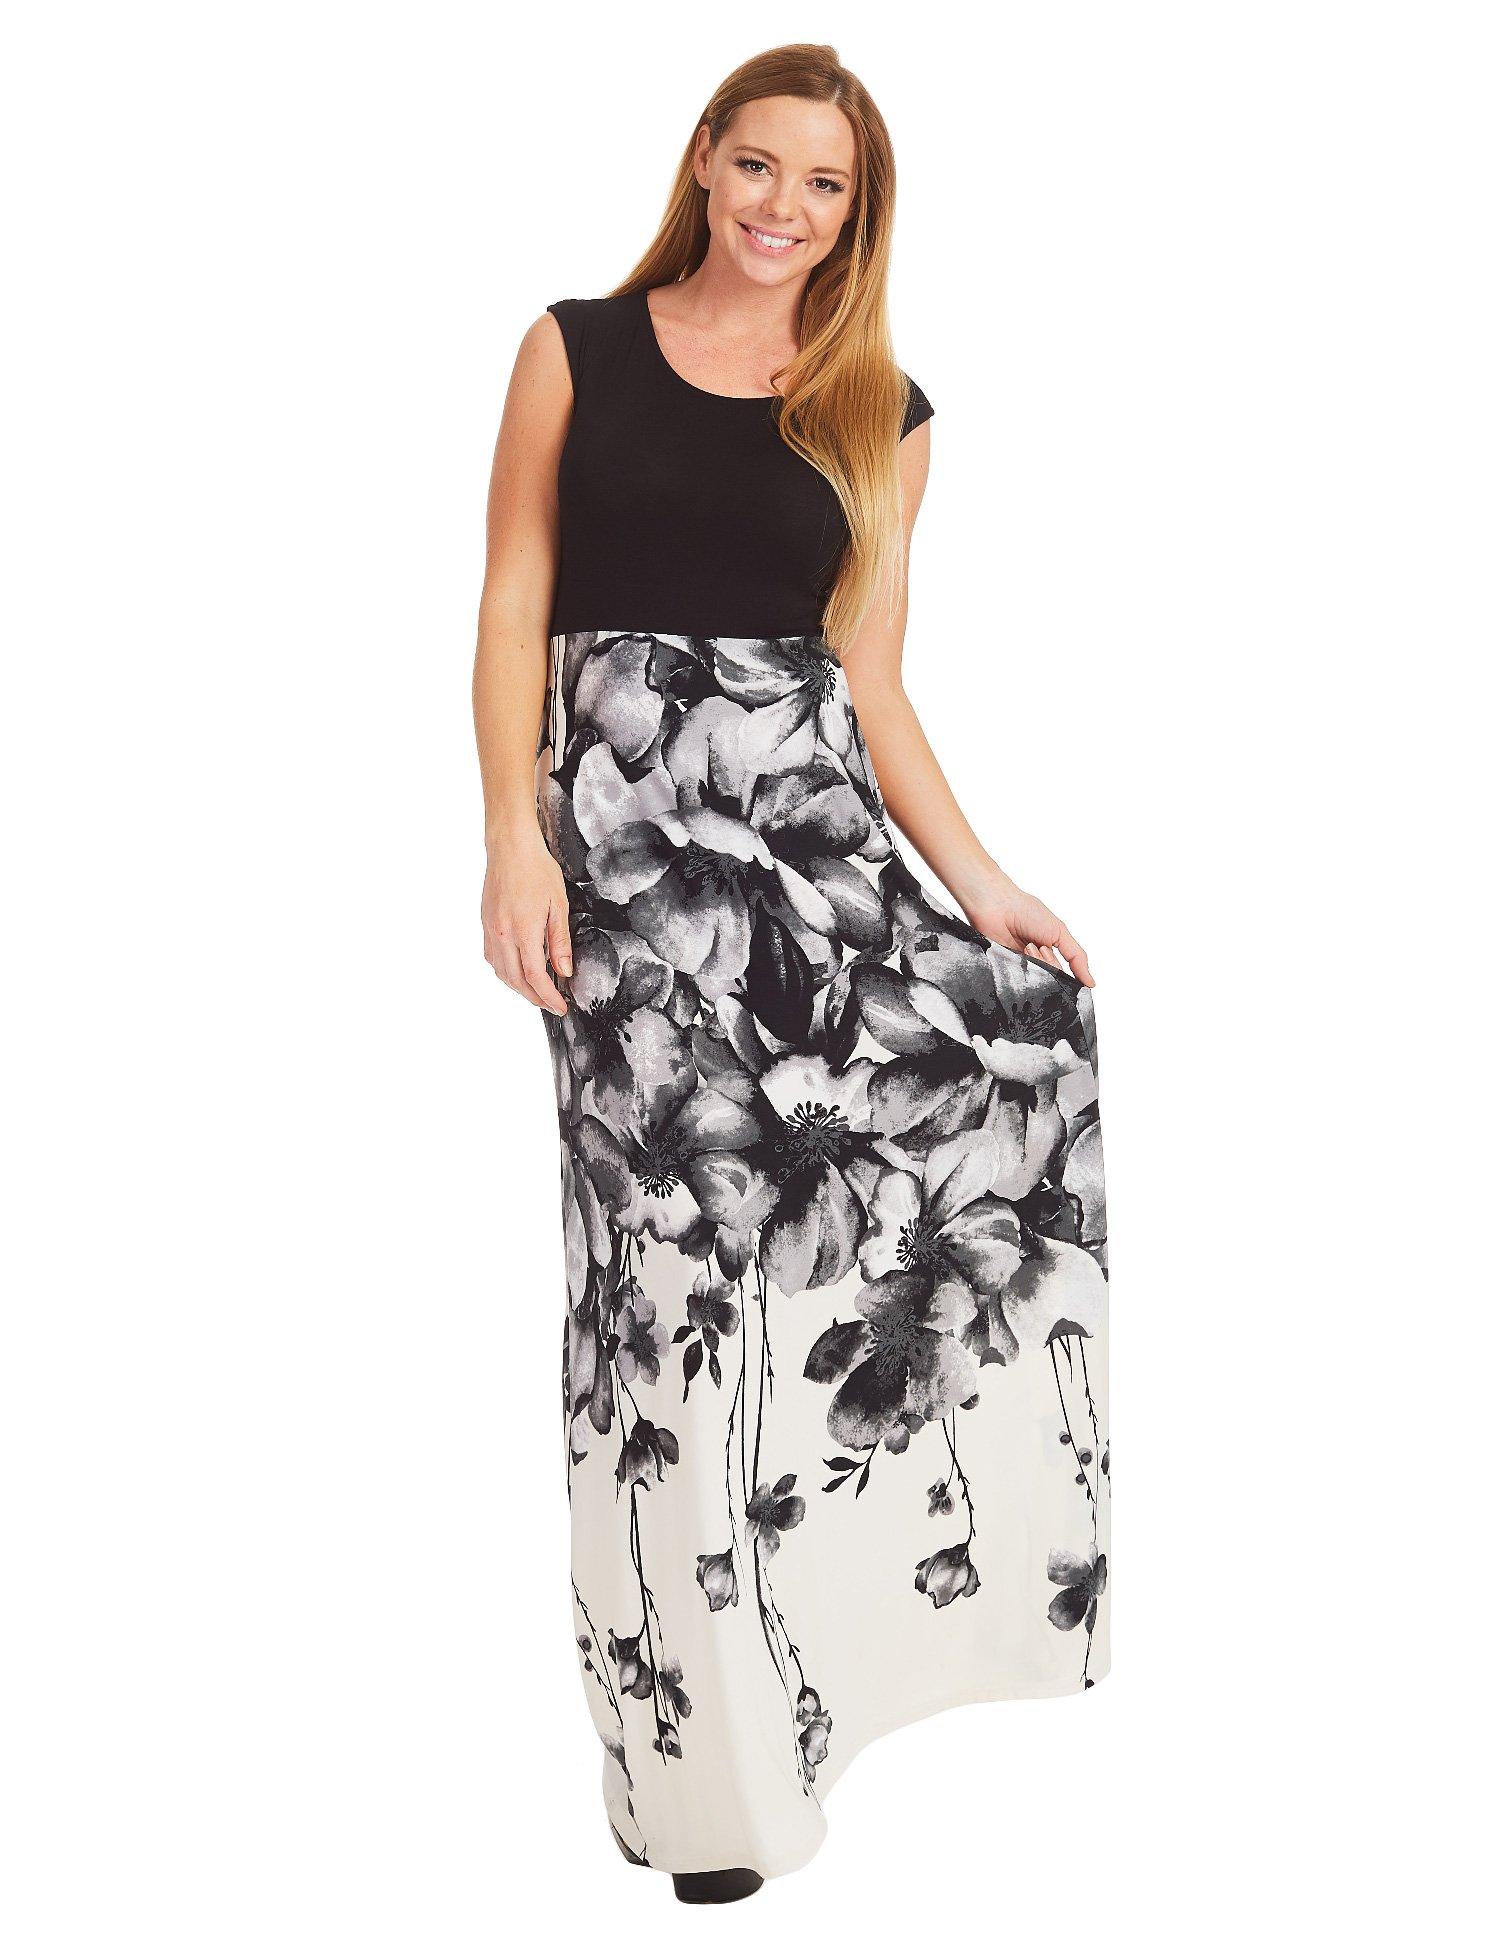 WB1390 Womens Print Contrast Sleeveless Empire Line Maxi Dress XXL BLACK_IVORY